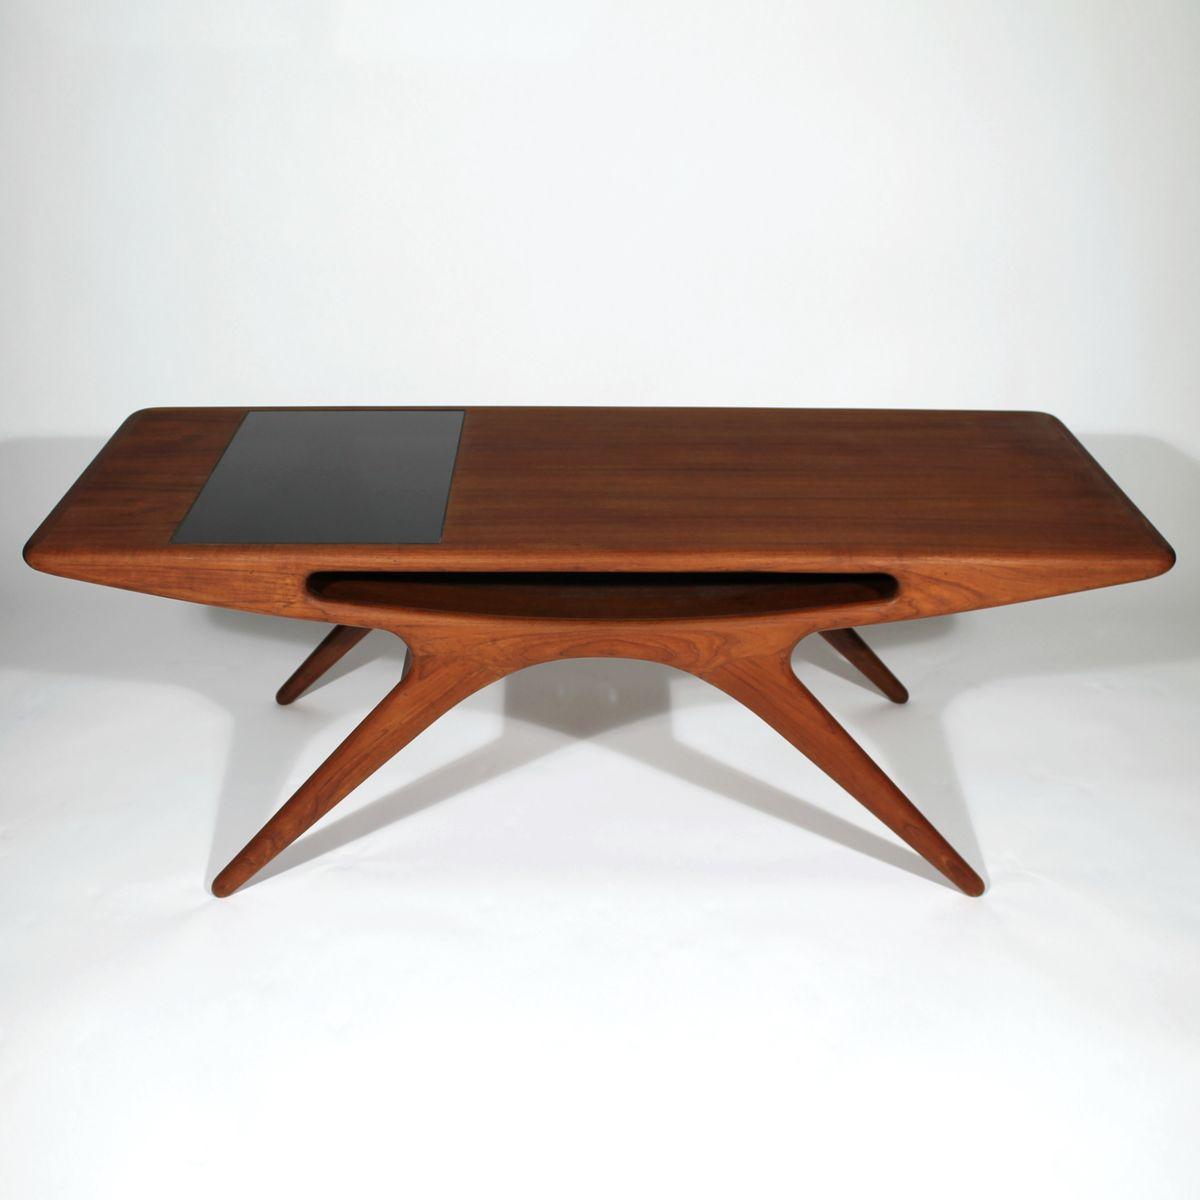 Danish Smile Teak Coffee Table By Johannes Andersen For Cfc Silkeborg 1957